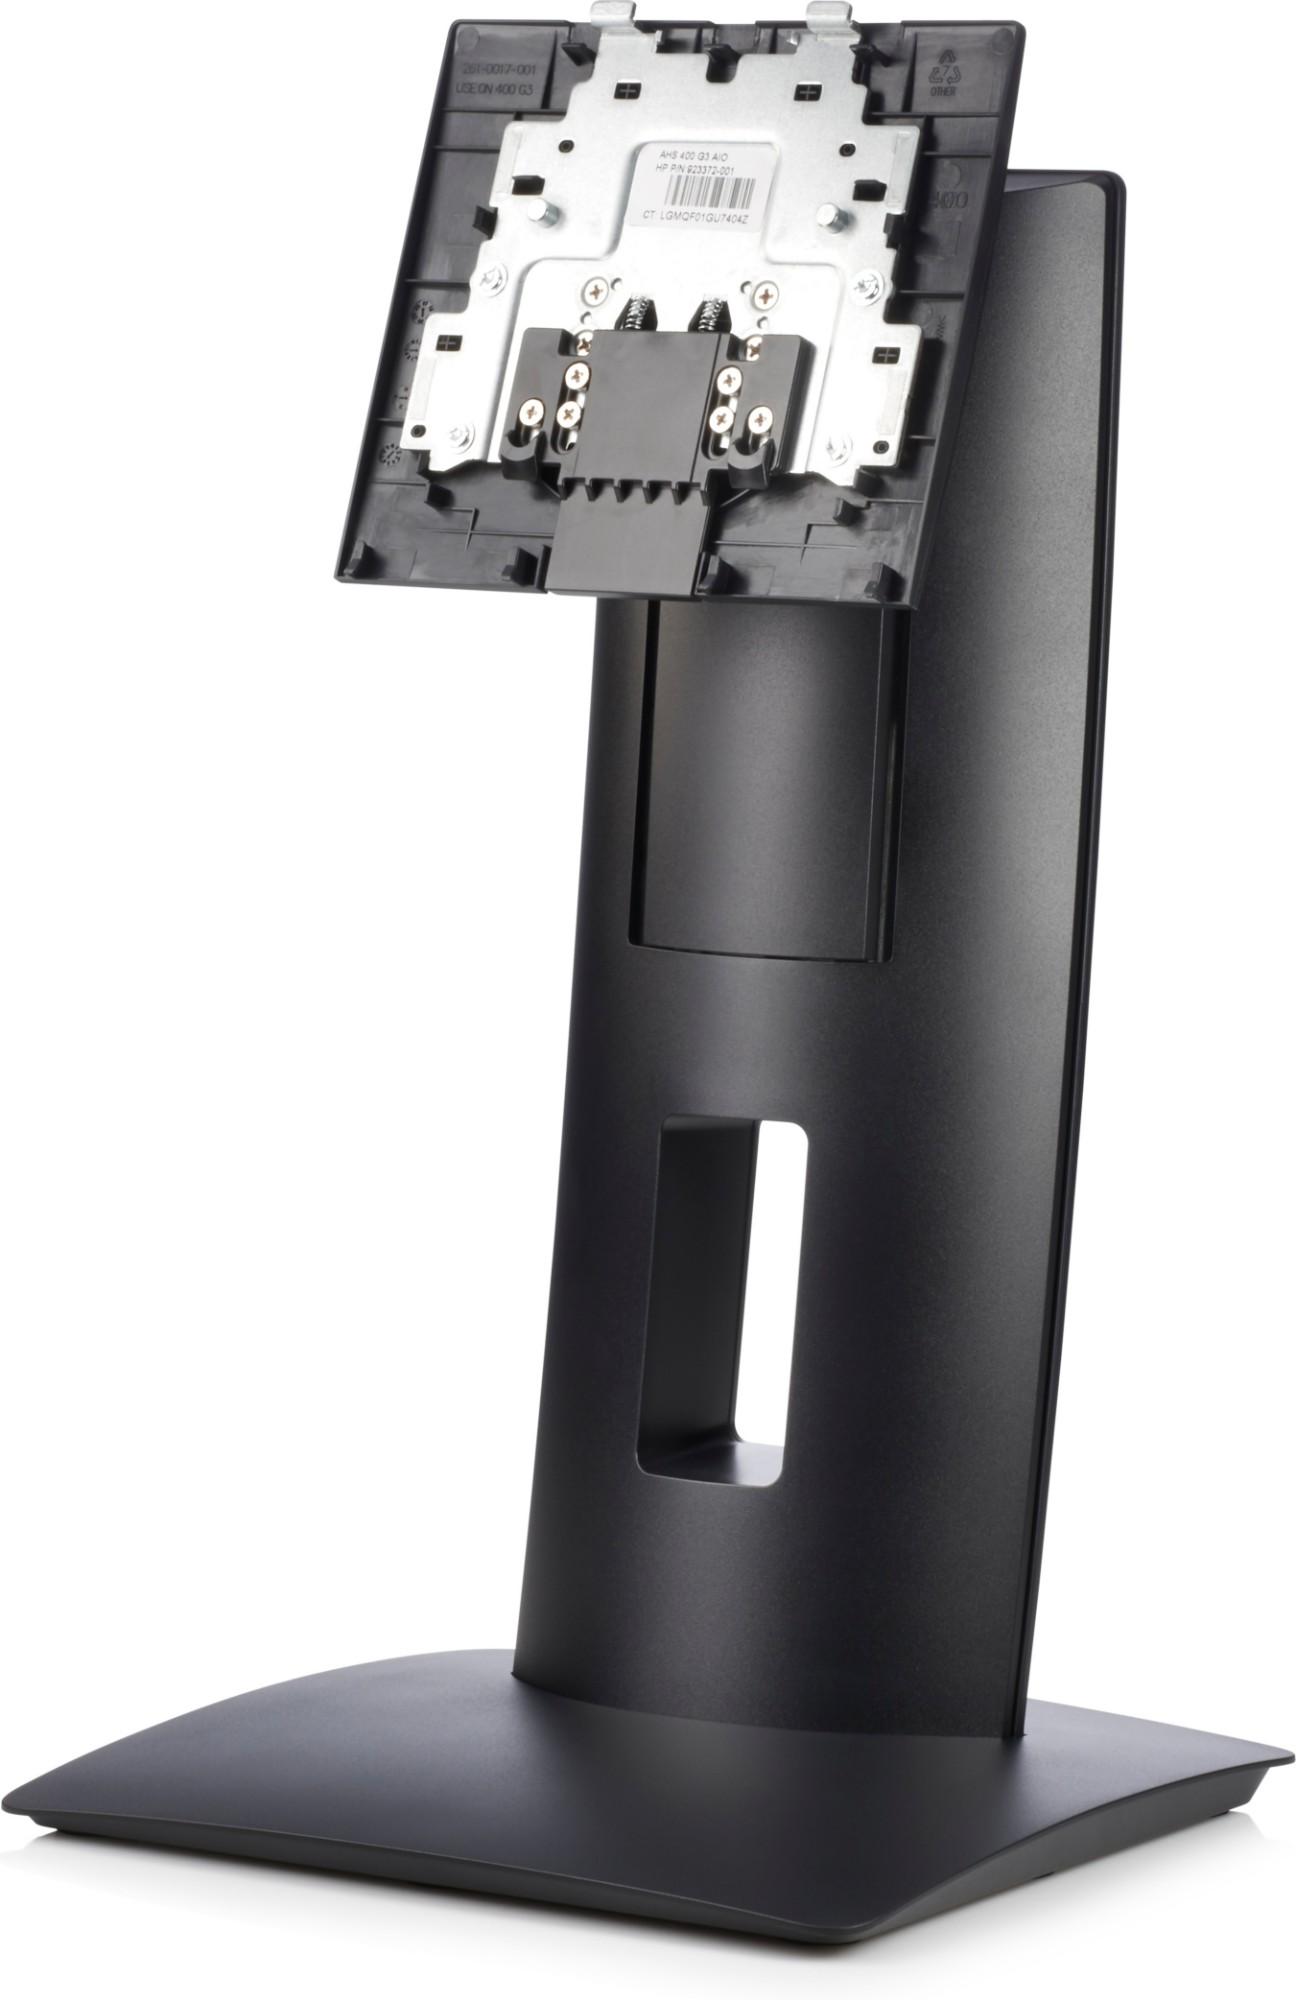 HP Soporte de altura ajustable ProOne 400 G3